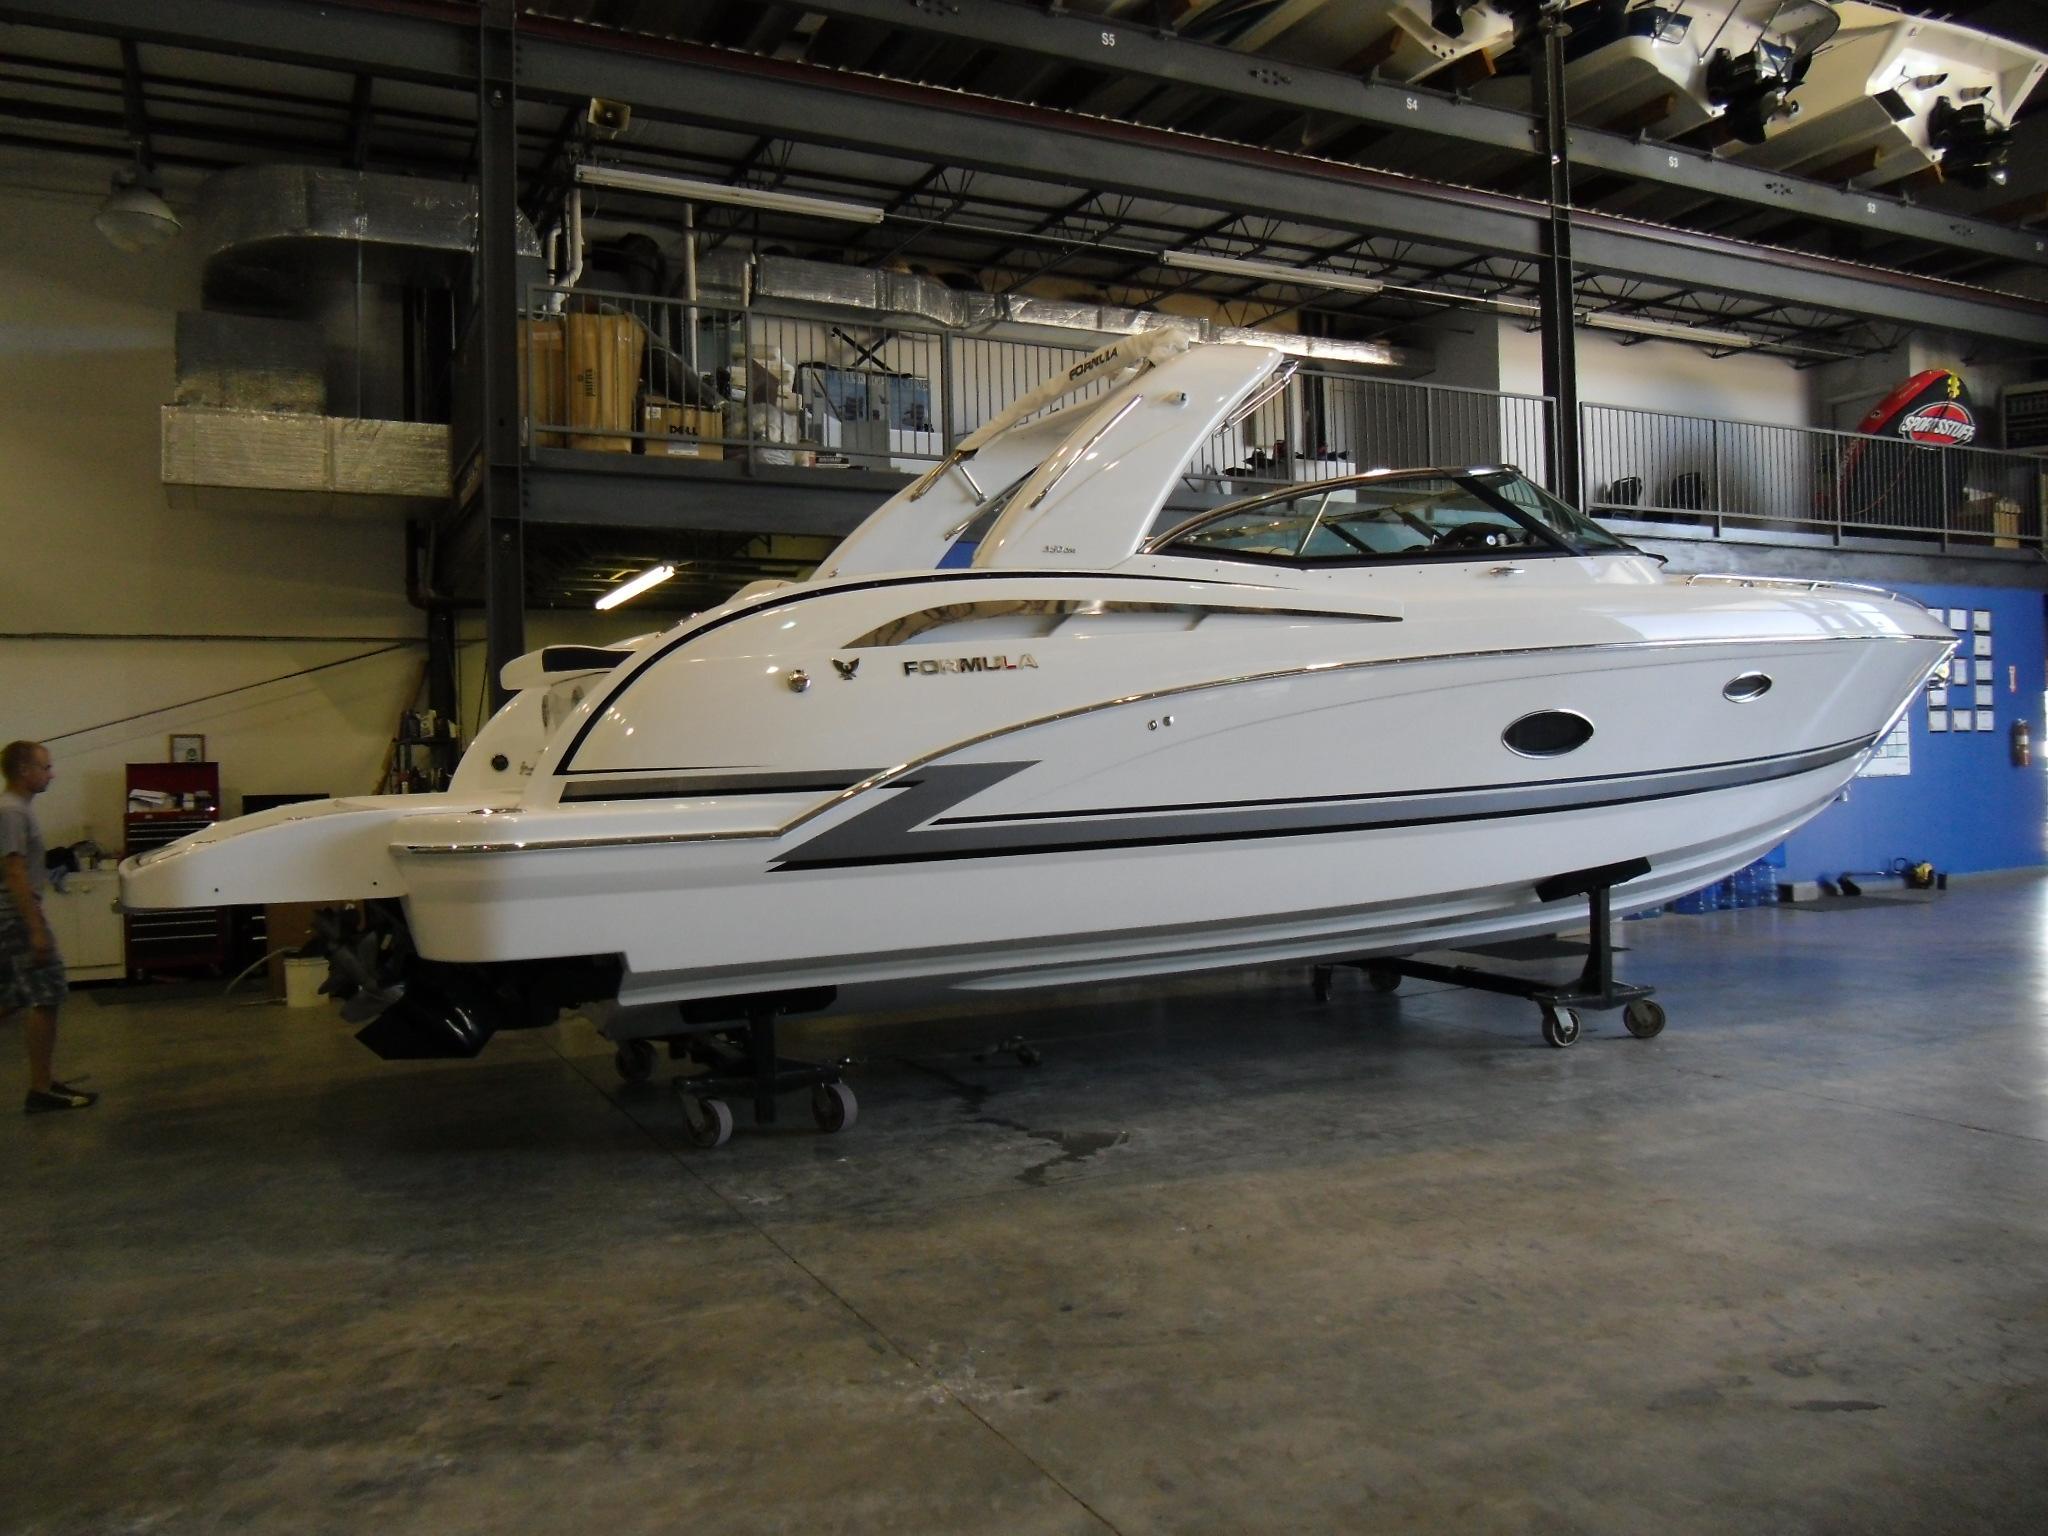 Craigslist Omaha Boats - Craigslist